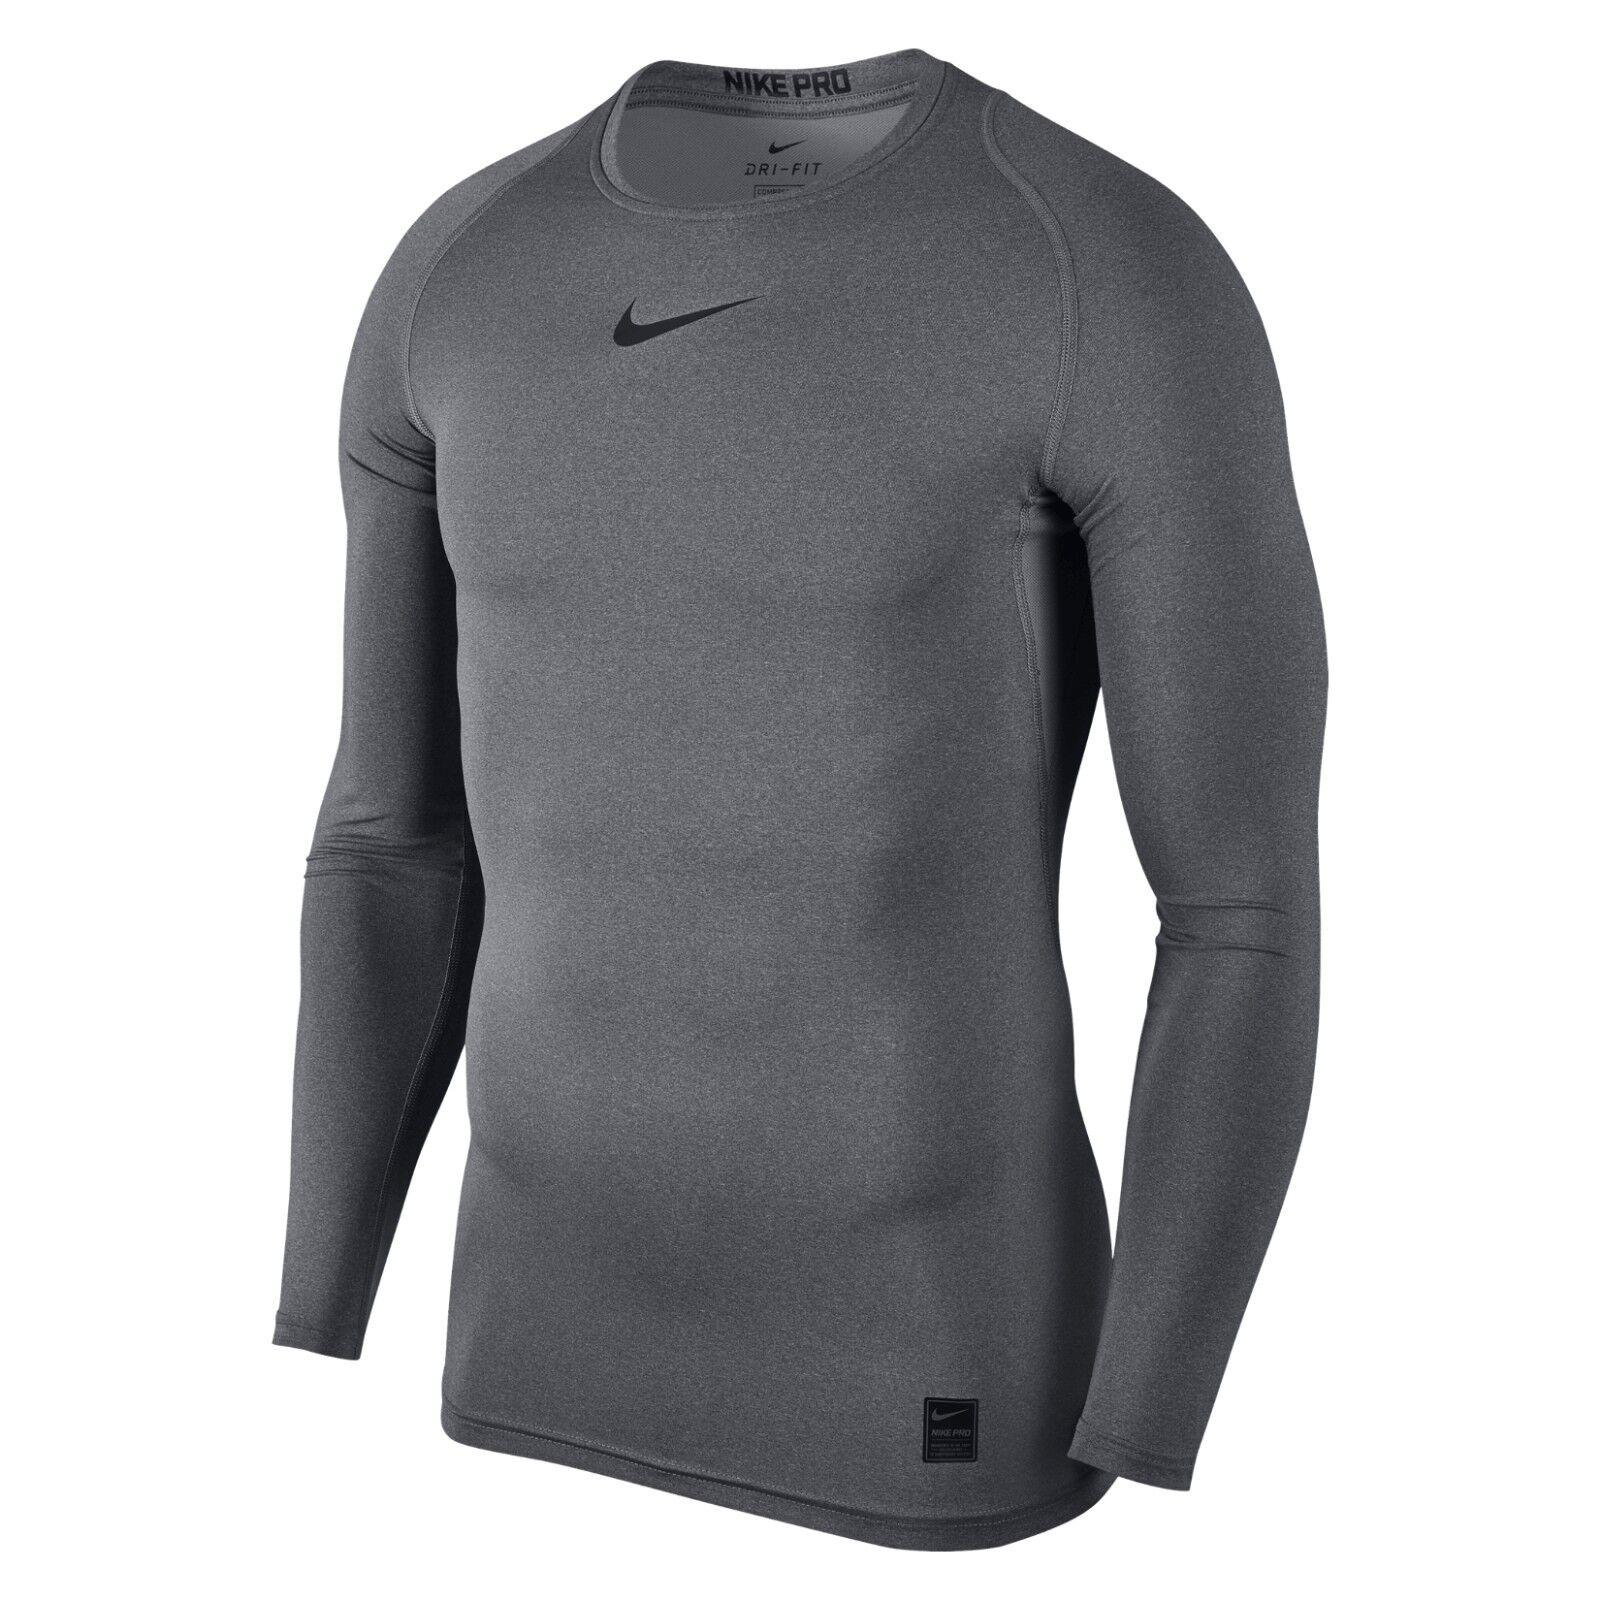 0cc92454 Nike Pro Combat 2.0 Men's Compression Long Sleeve Dri-fit Shirt L ...